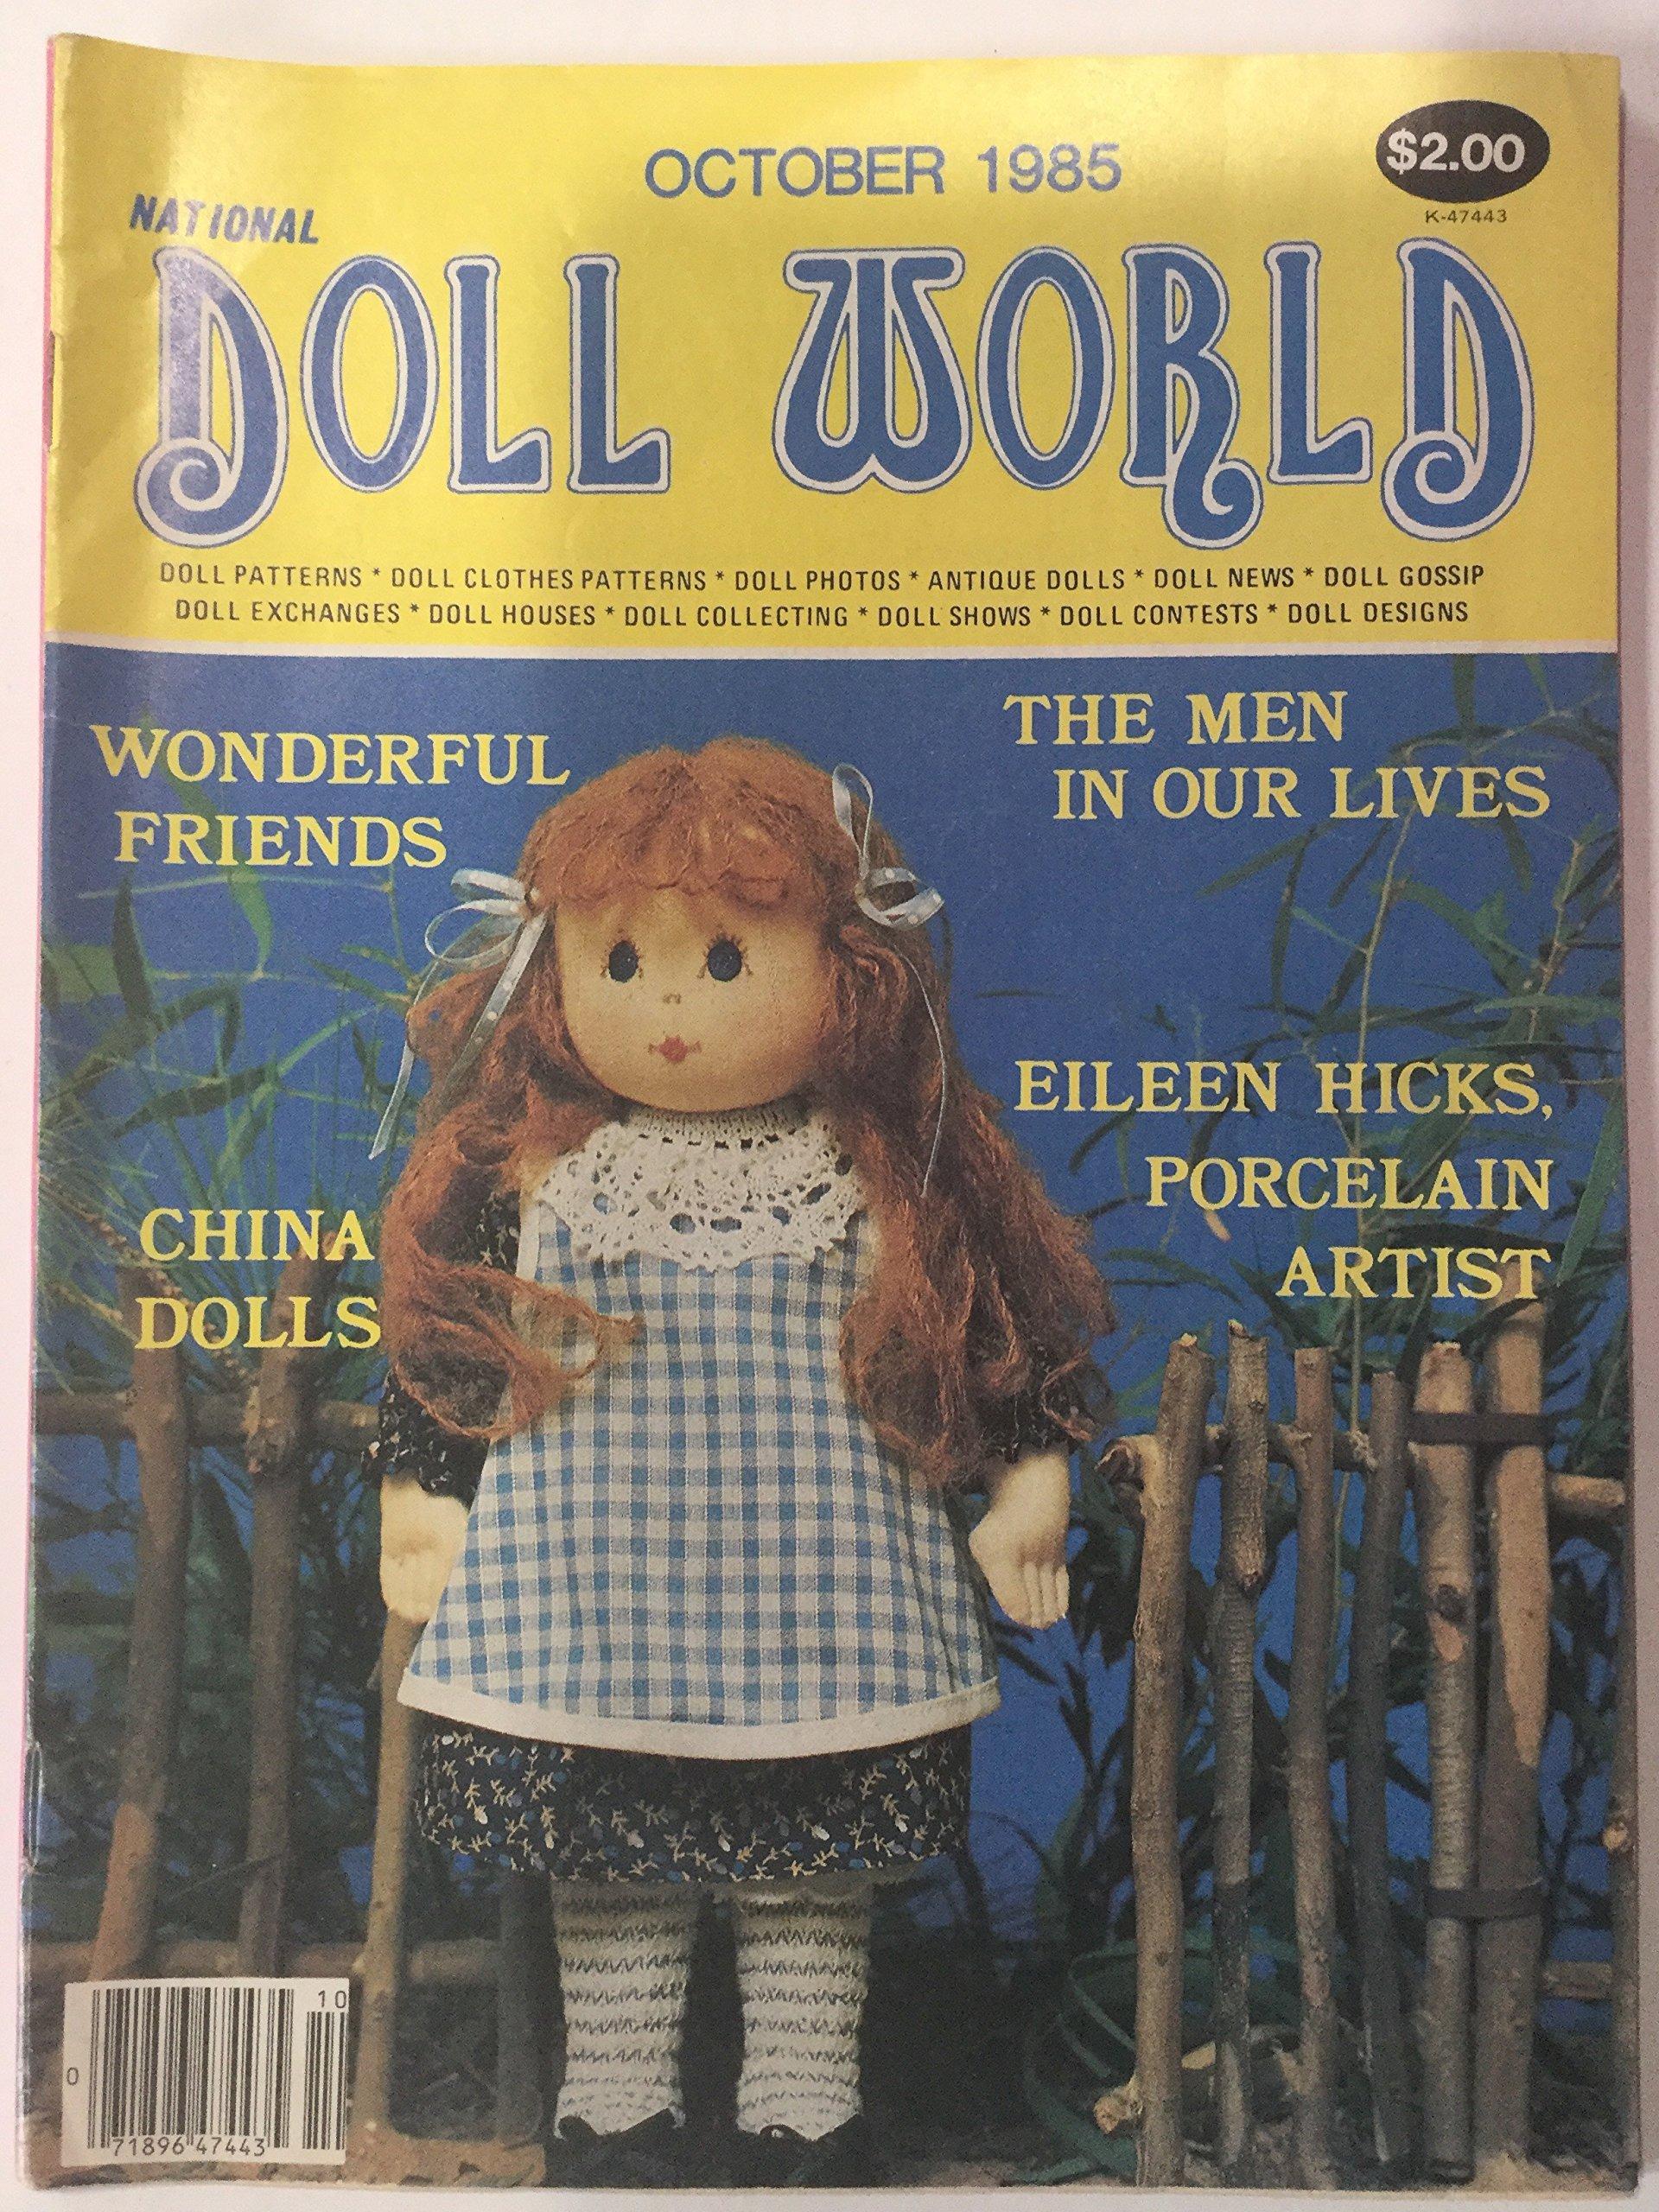 NATIONAL DOLL WORLD September / October 1985 (Magazine, The Magazine for Doll Lovers, China Dolls, Eileen Hicks, Porcelain Artist, Wonderful Friends)